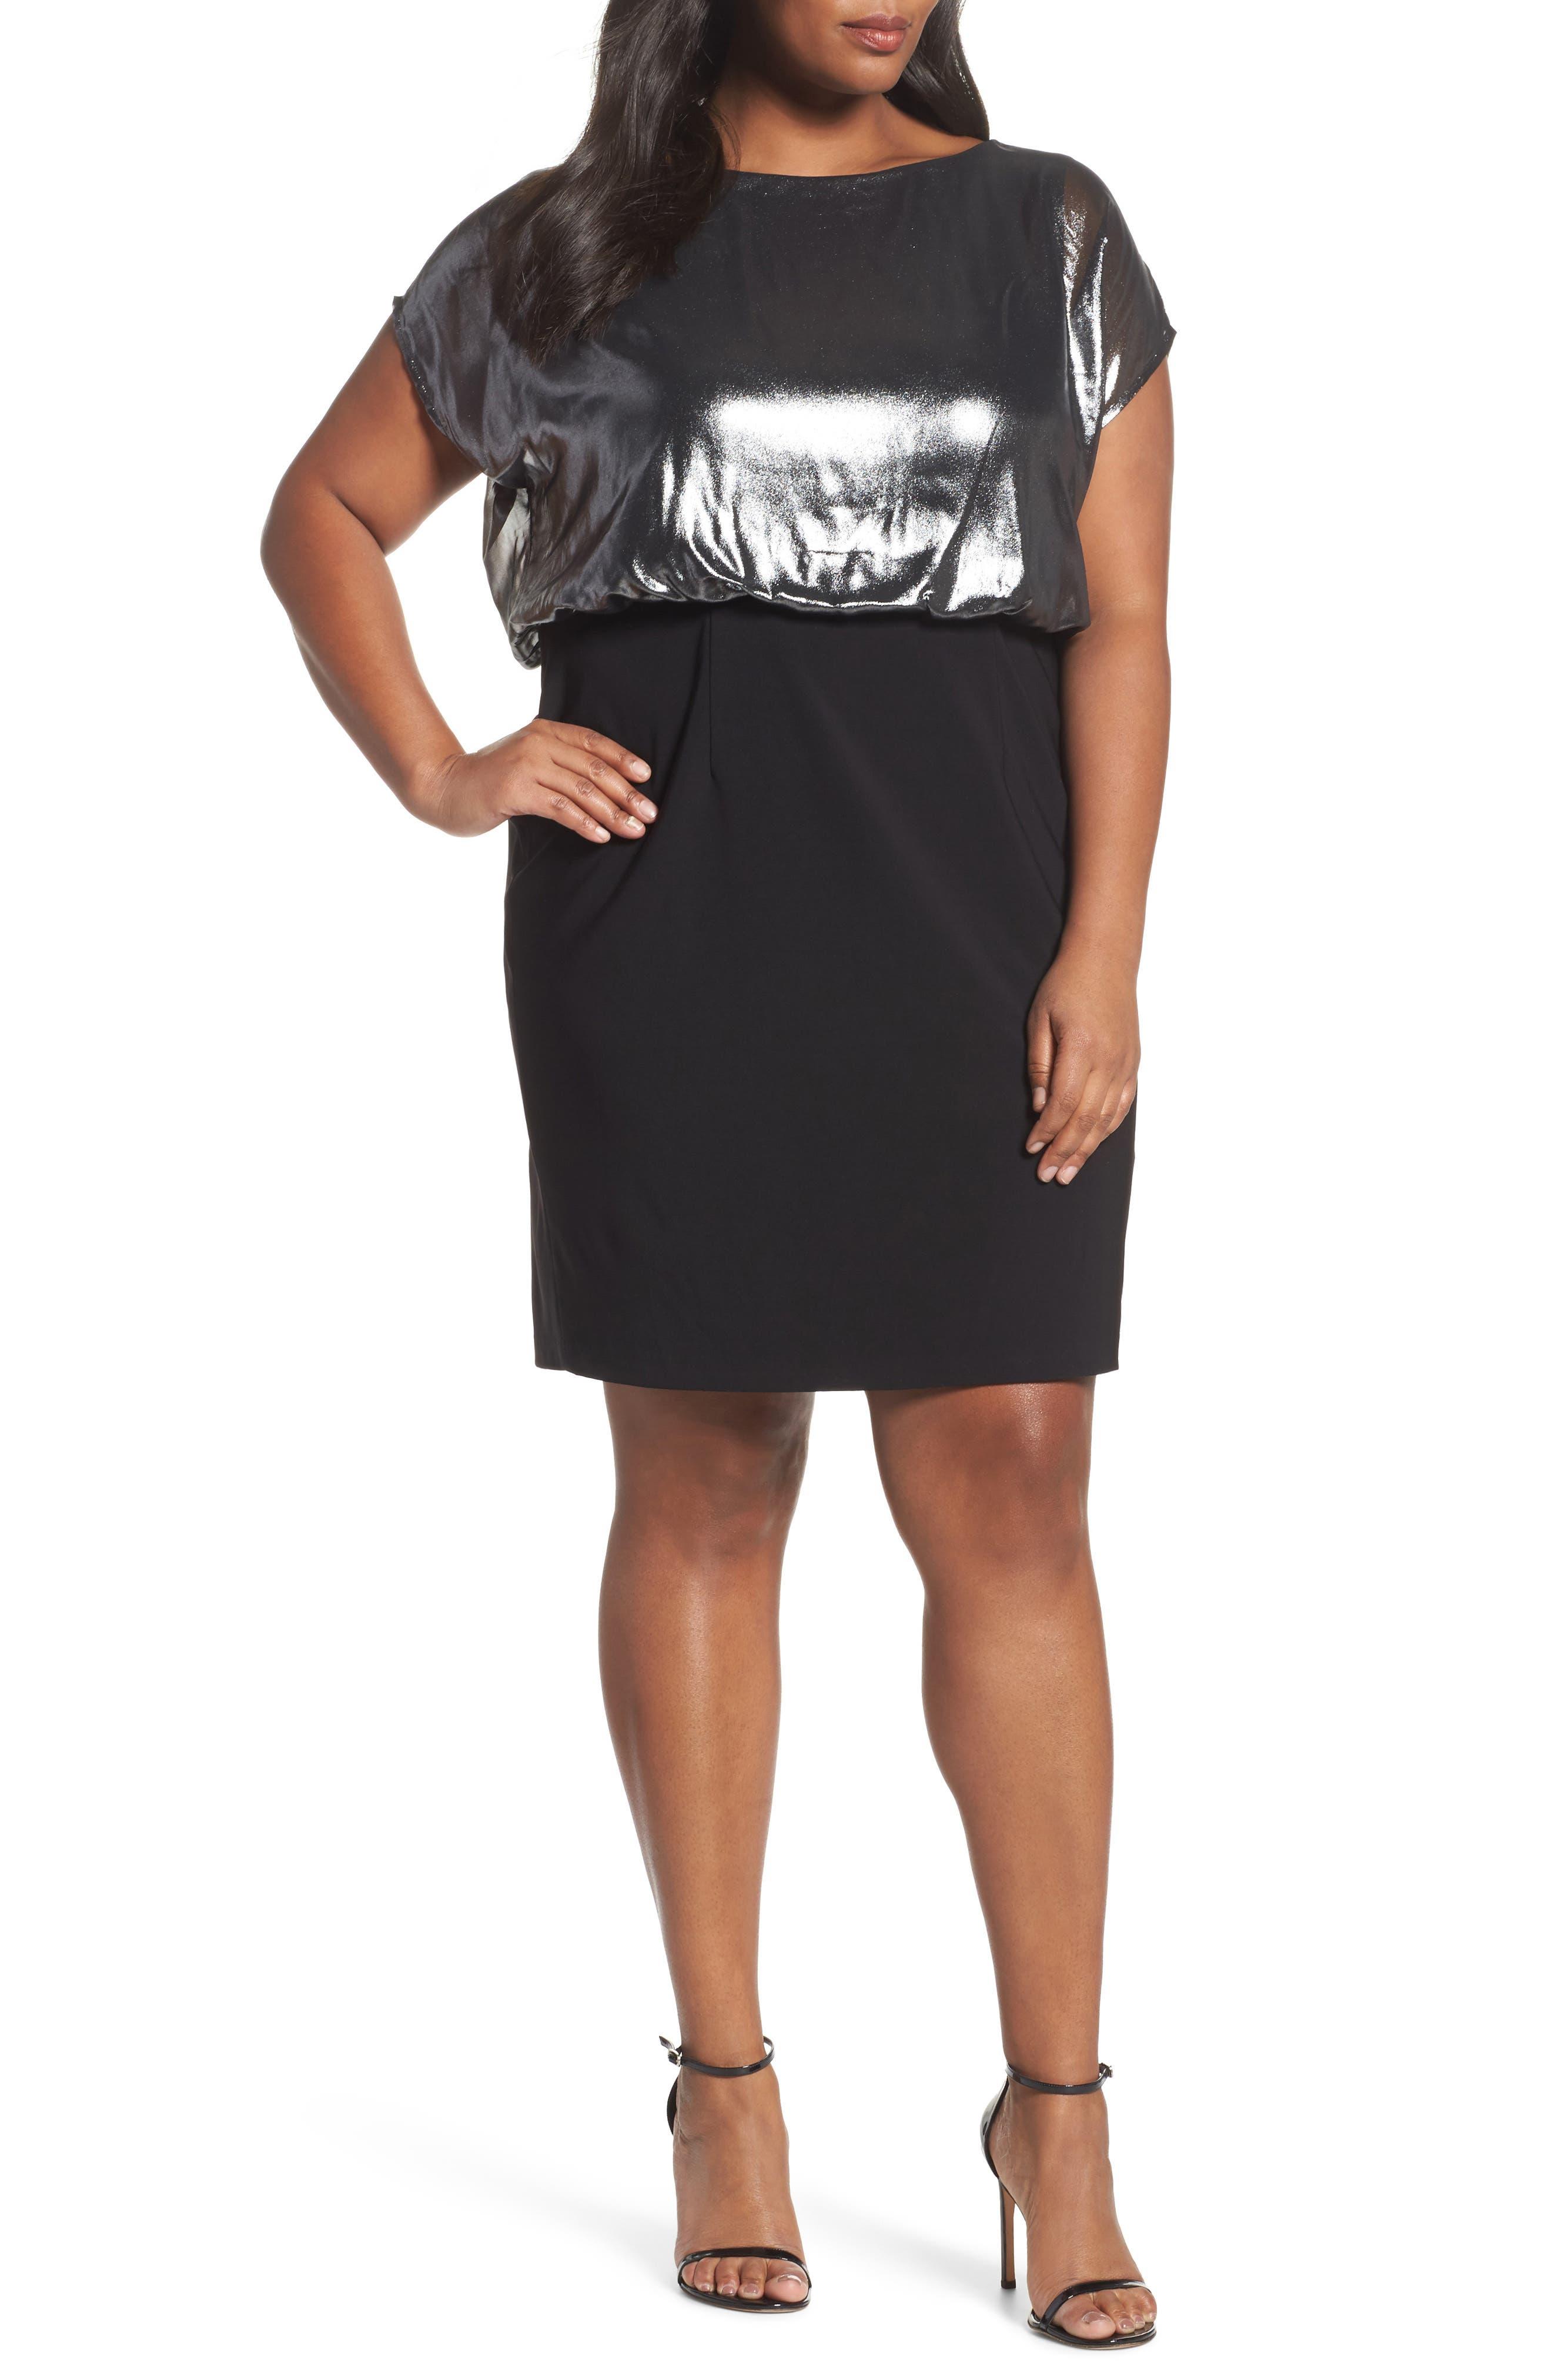 Adrianna Papell Foiled Blouson Dress (Plus Size)